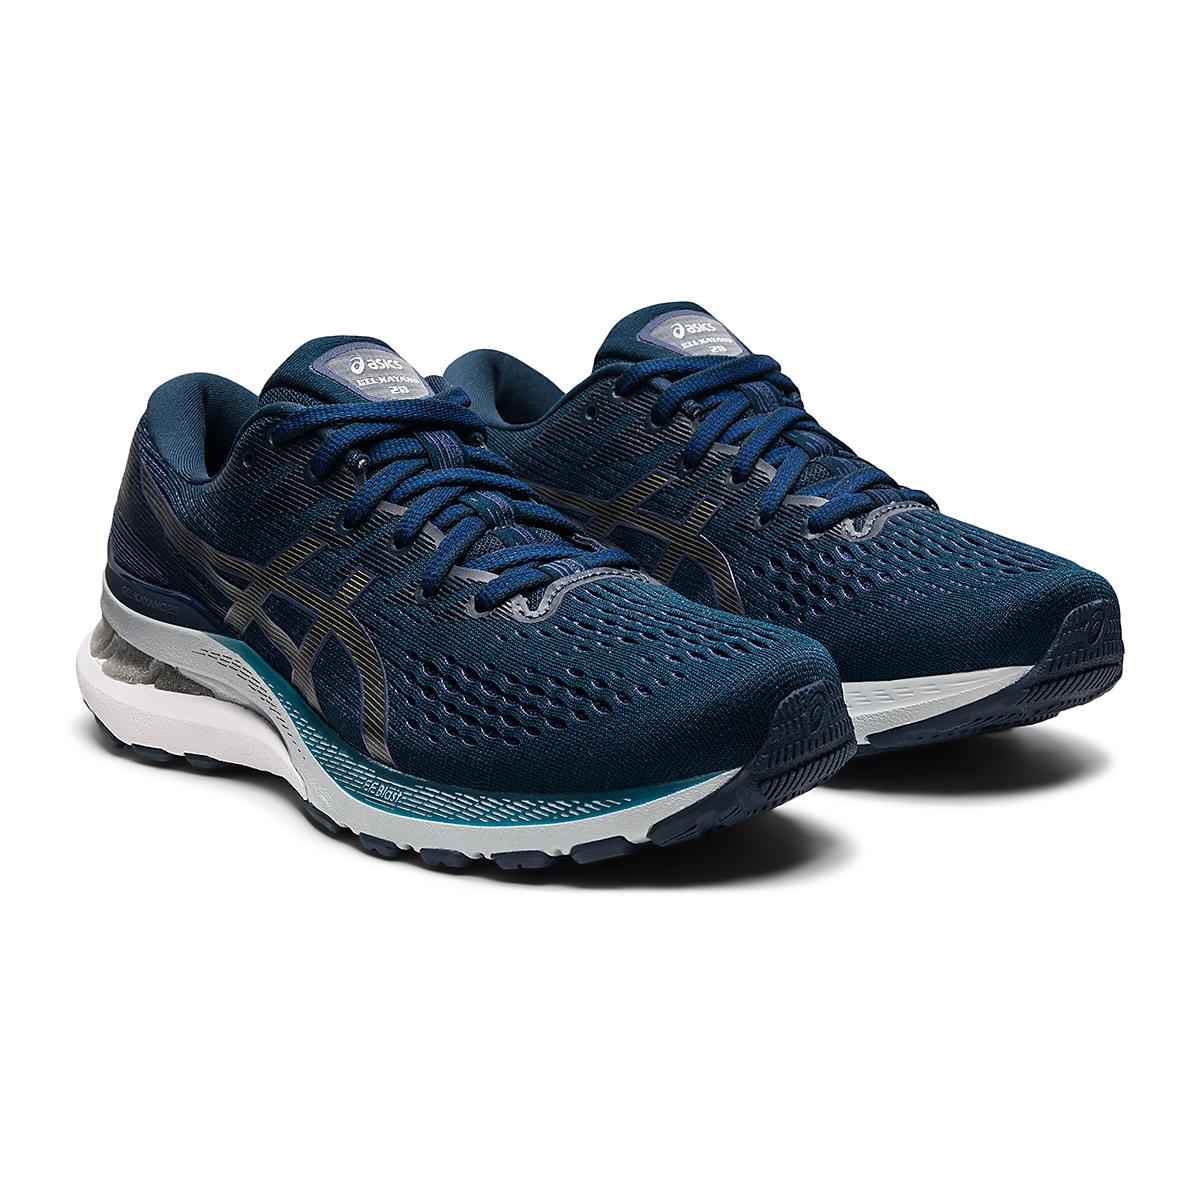 Women's Asics Gel-Kayano 28 Running Shoe - Color: French Blue/Thunder Blue - Size: 5 - Width: Wide, French Blue/Thunder Blue, large, image 3